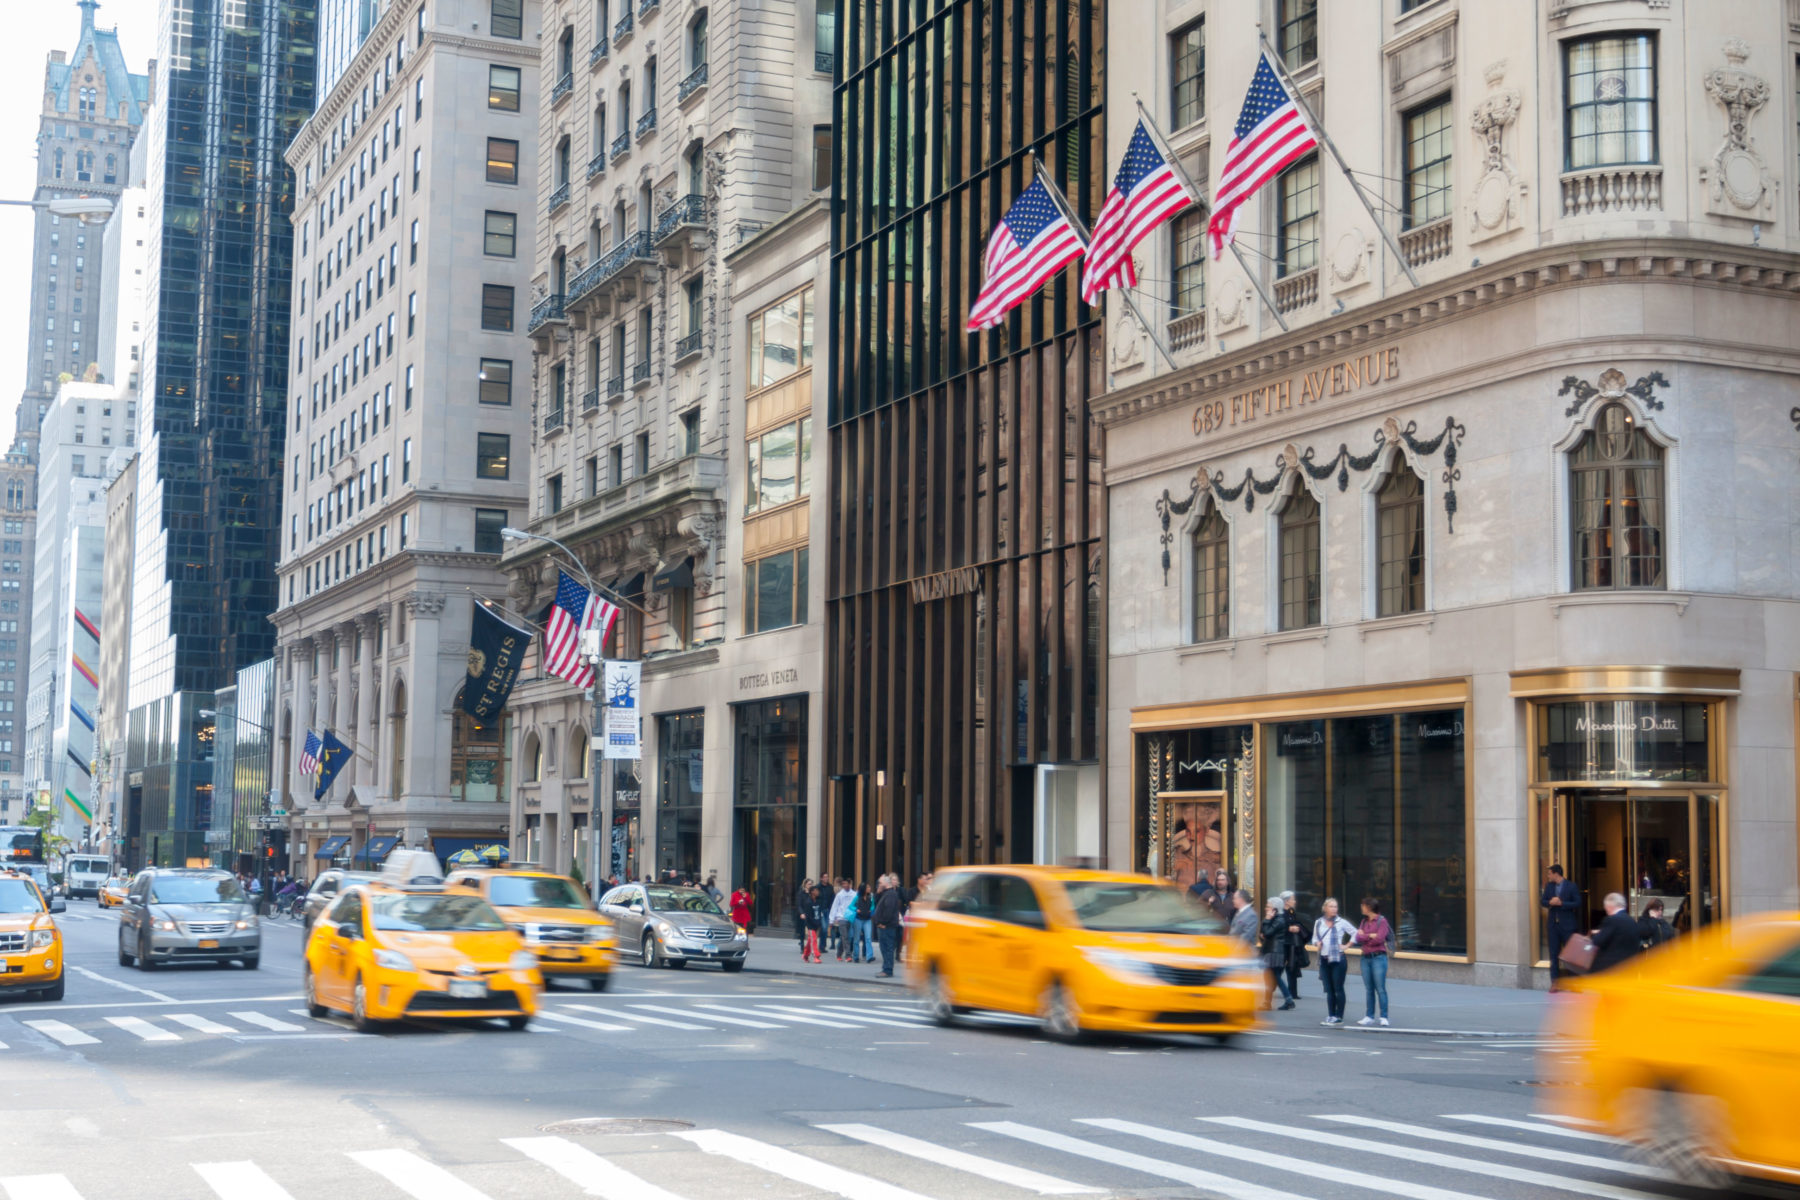 New York's Fifth Avenue